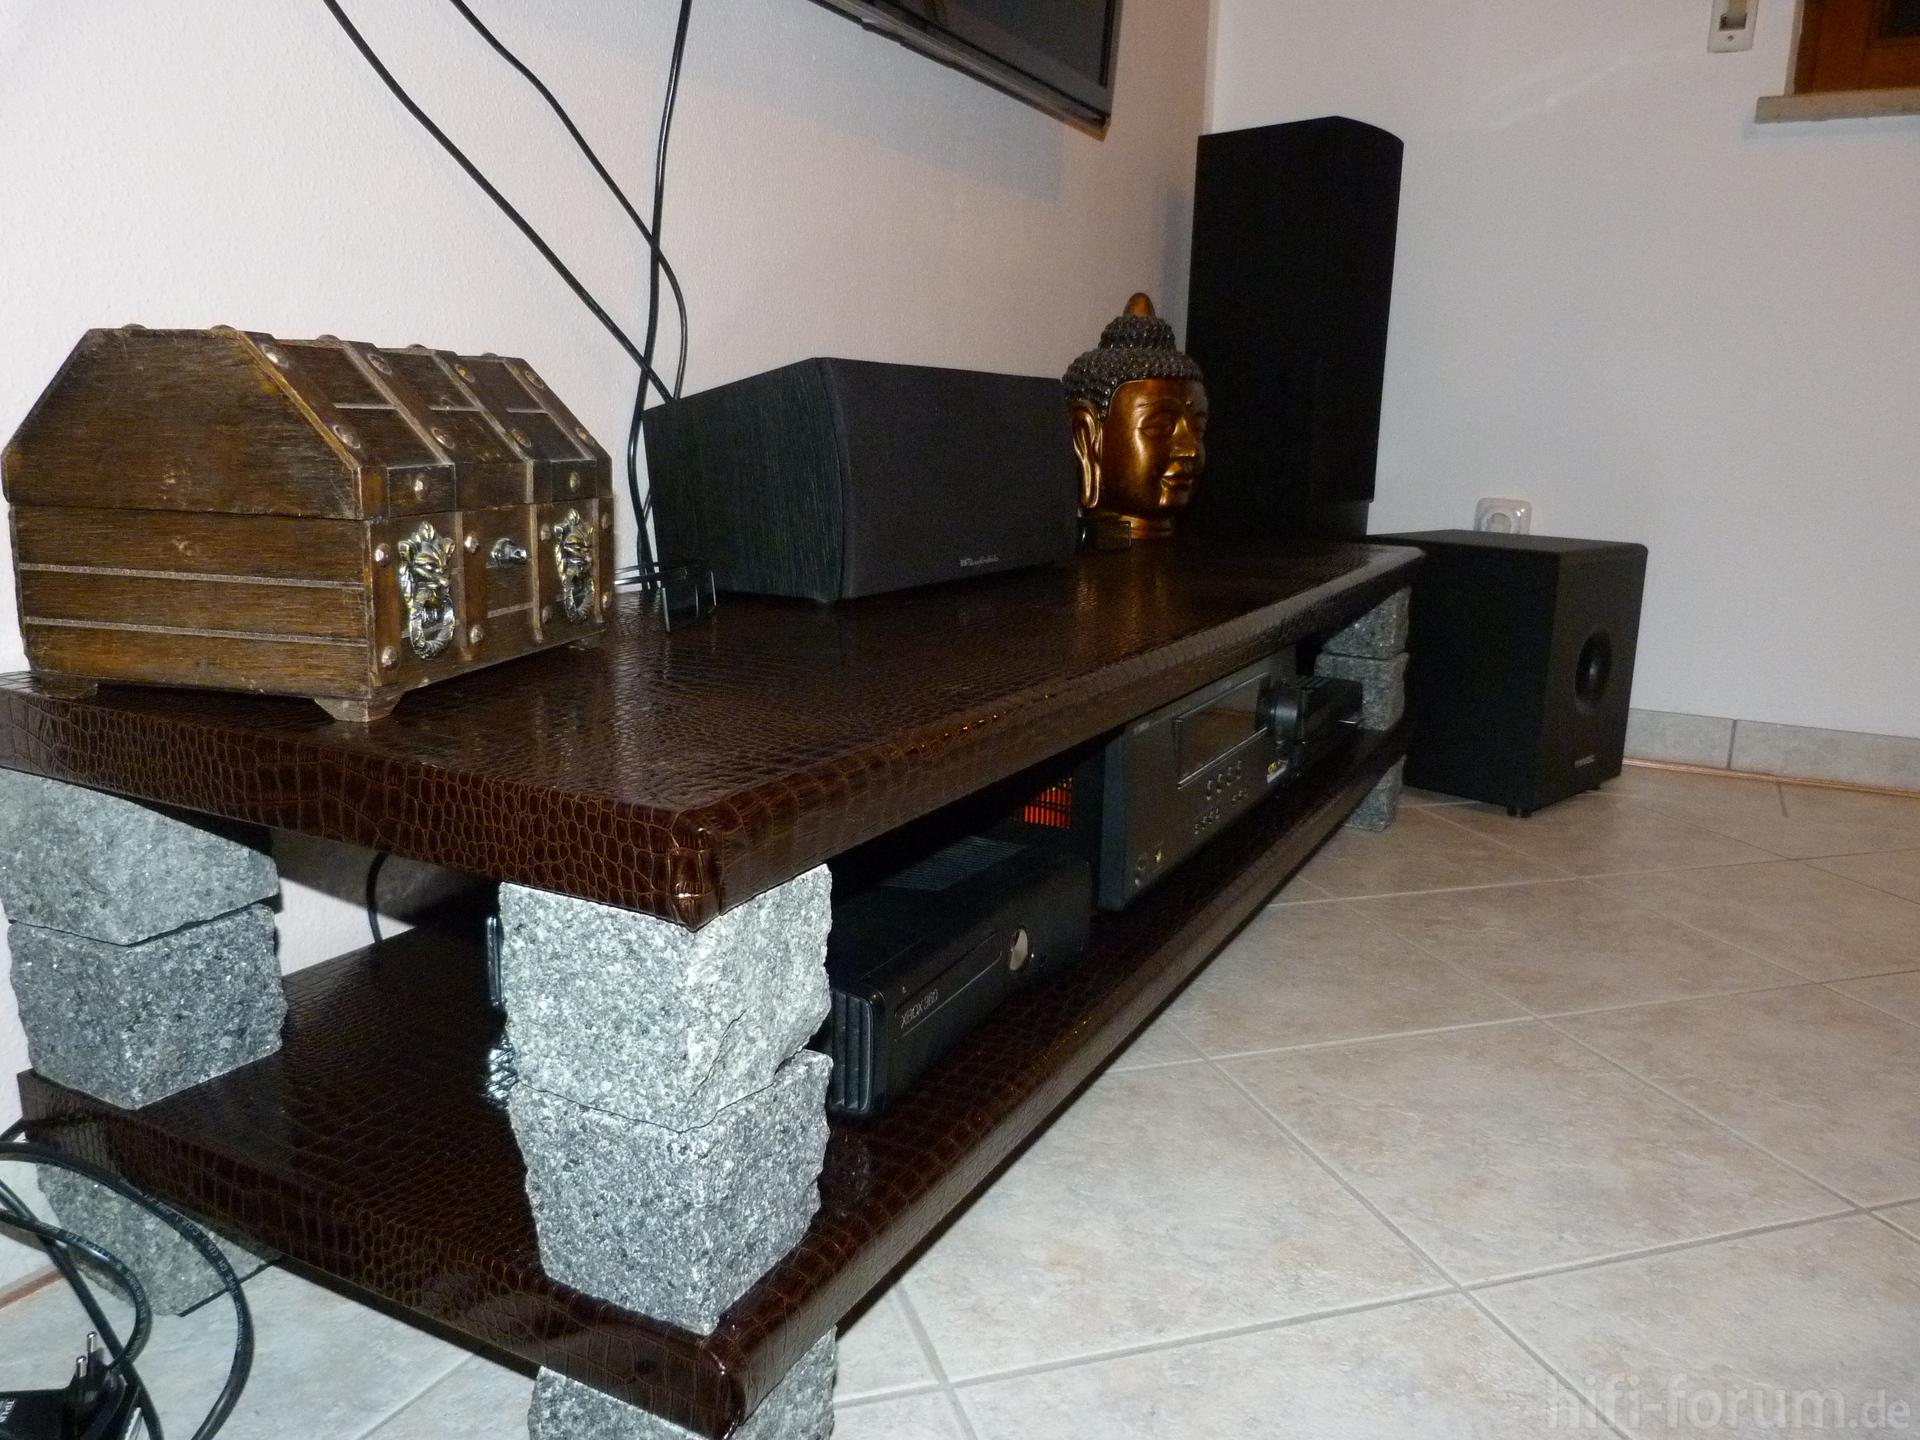 p1010990 hifi bildergalerie. Black Bedroom Furniture Sets. Home Design Ideas